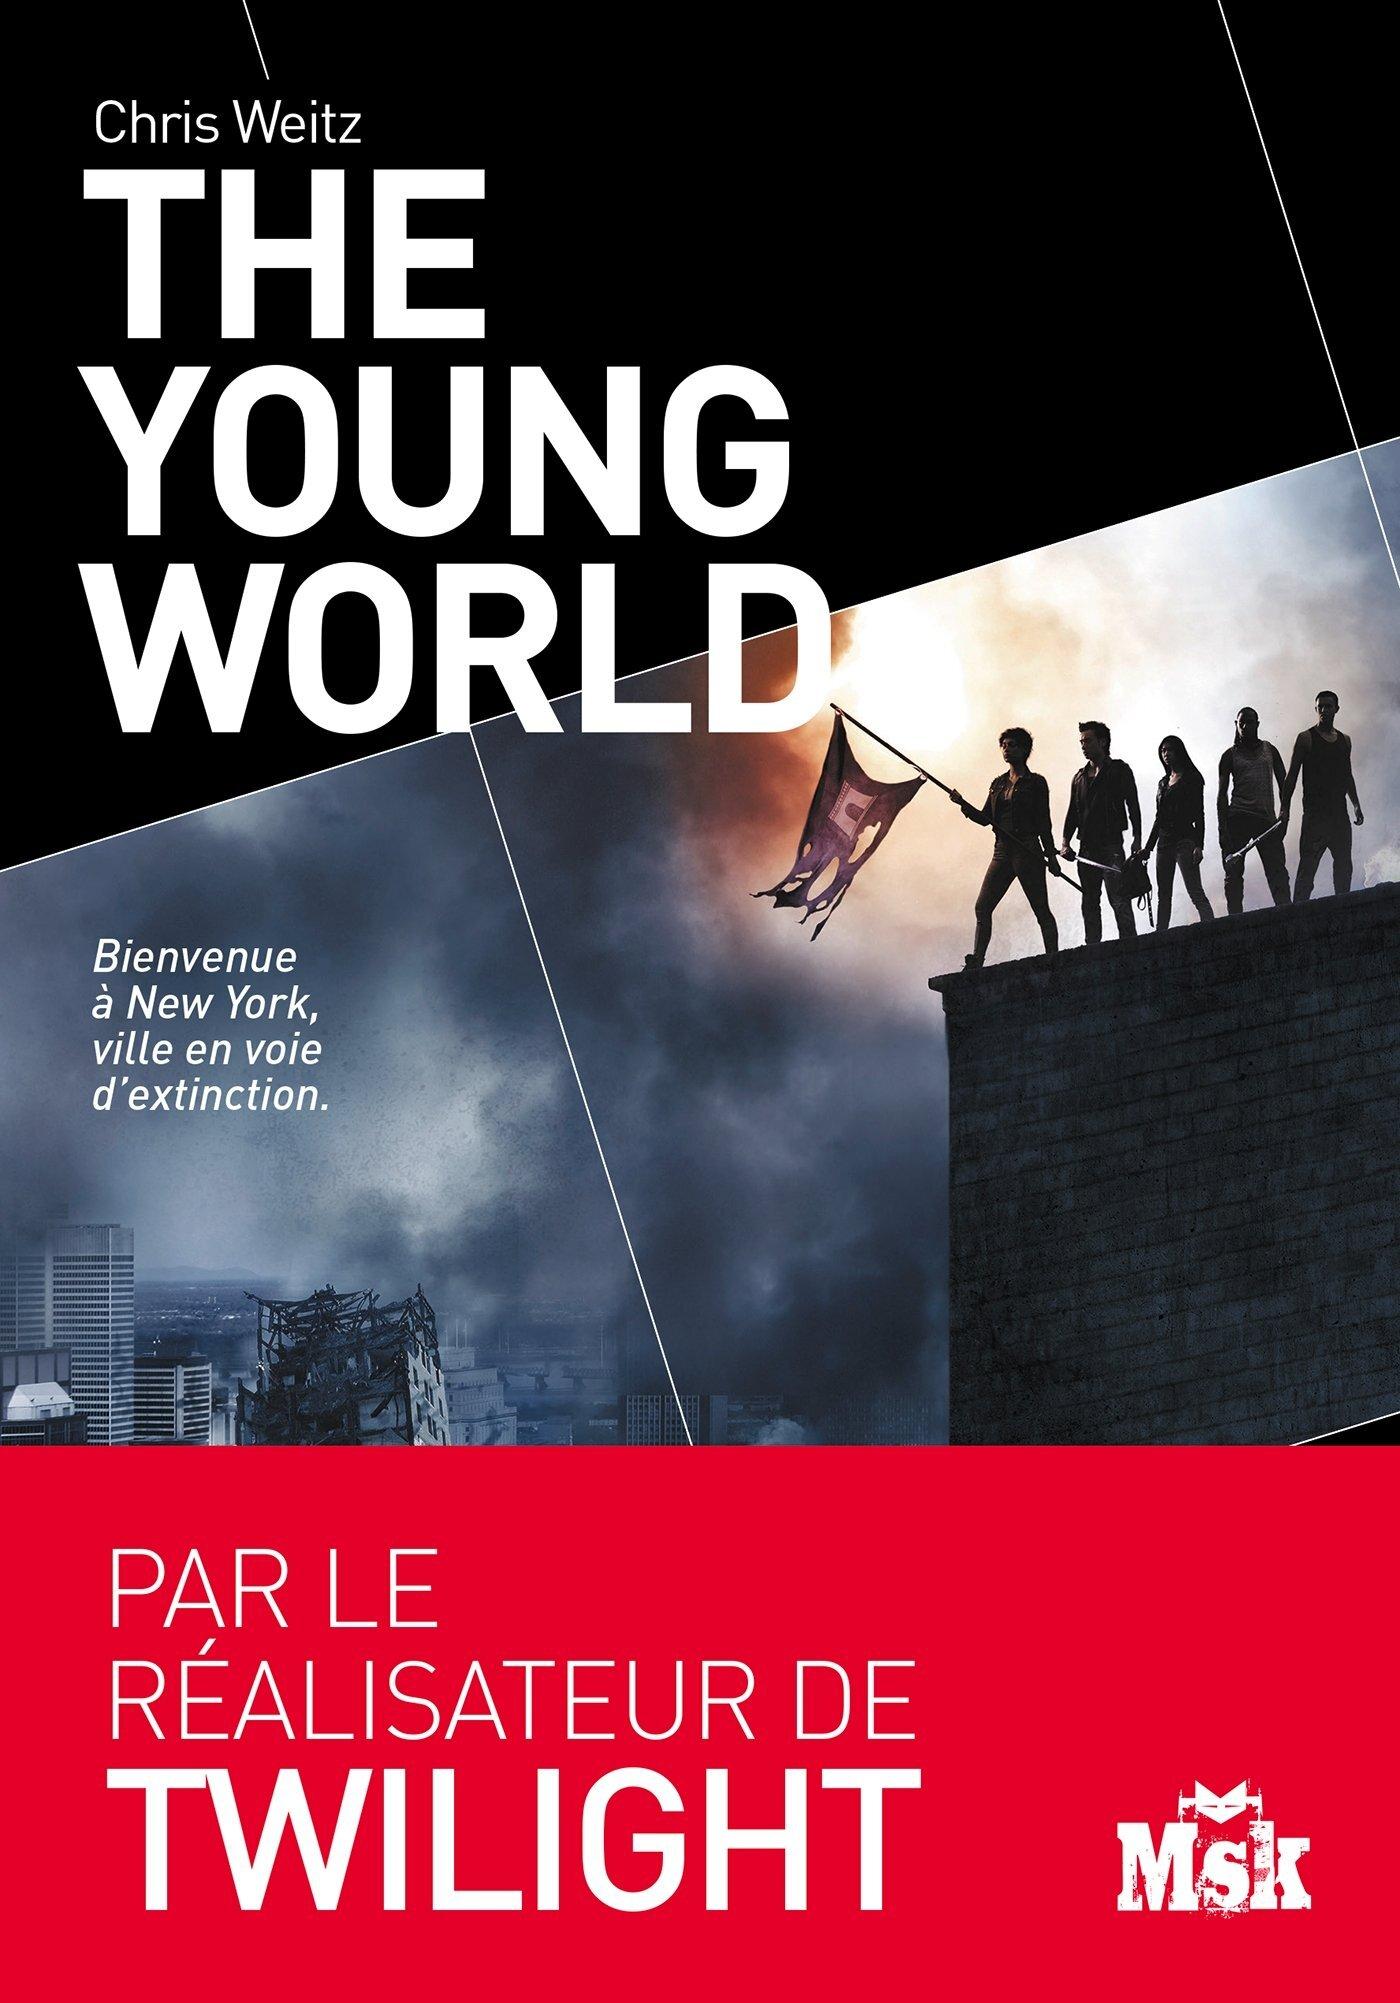 LECTURE COMMUNE DE NOVEMBRE 2019 The-young-world-552371